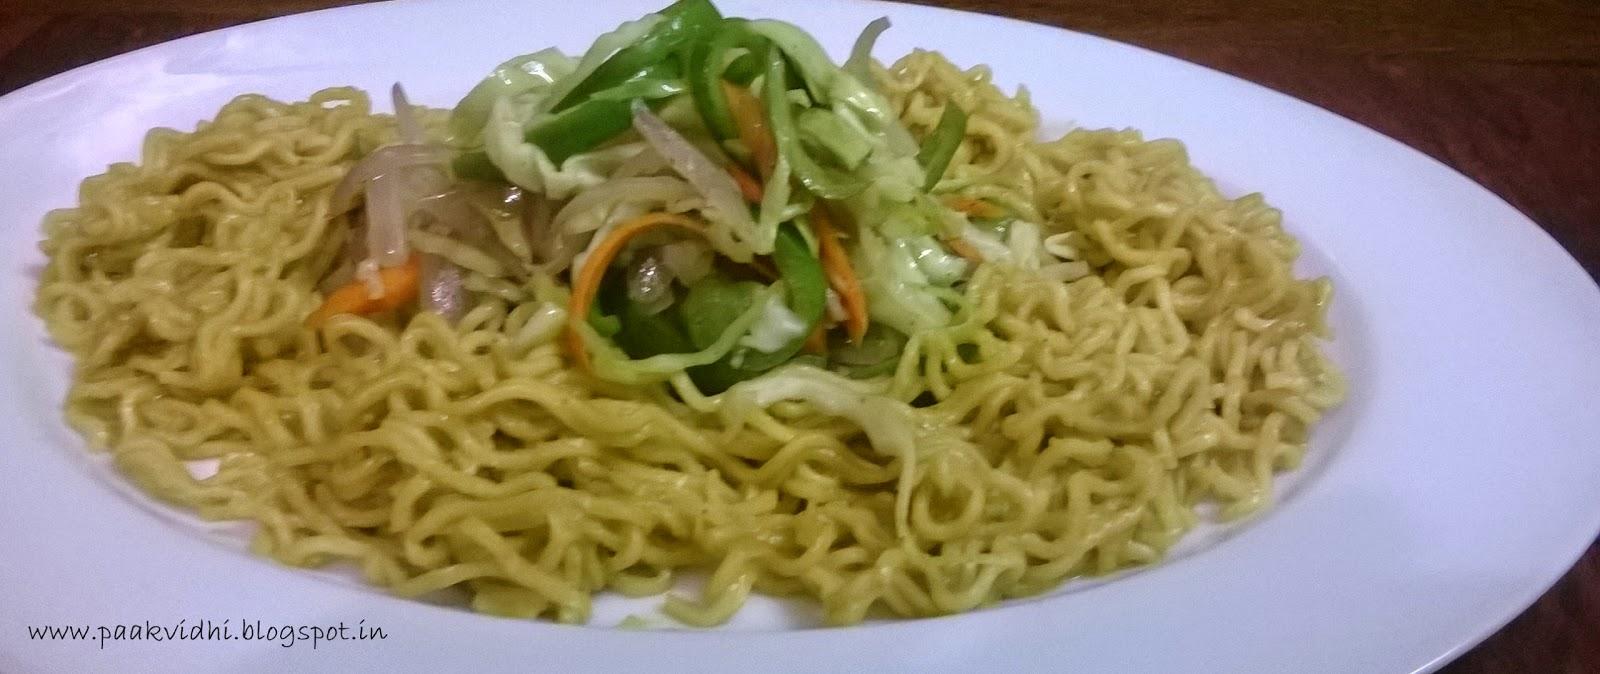 http://paakvidhi.blogspot.in/2014/08/maggi-stir-fried-veg-noodles-maggi.html